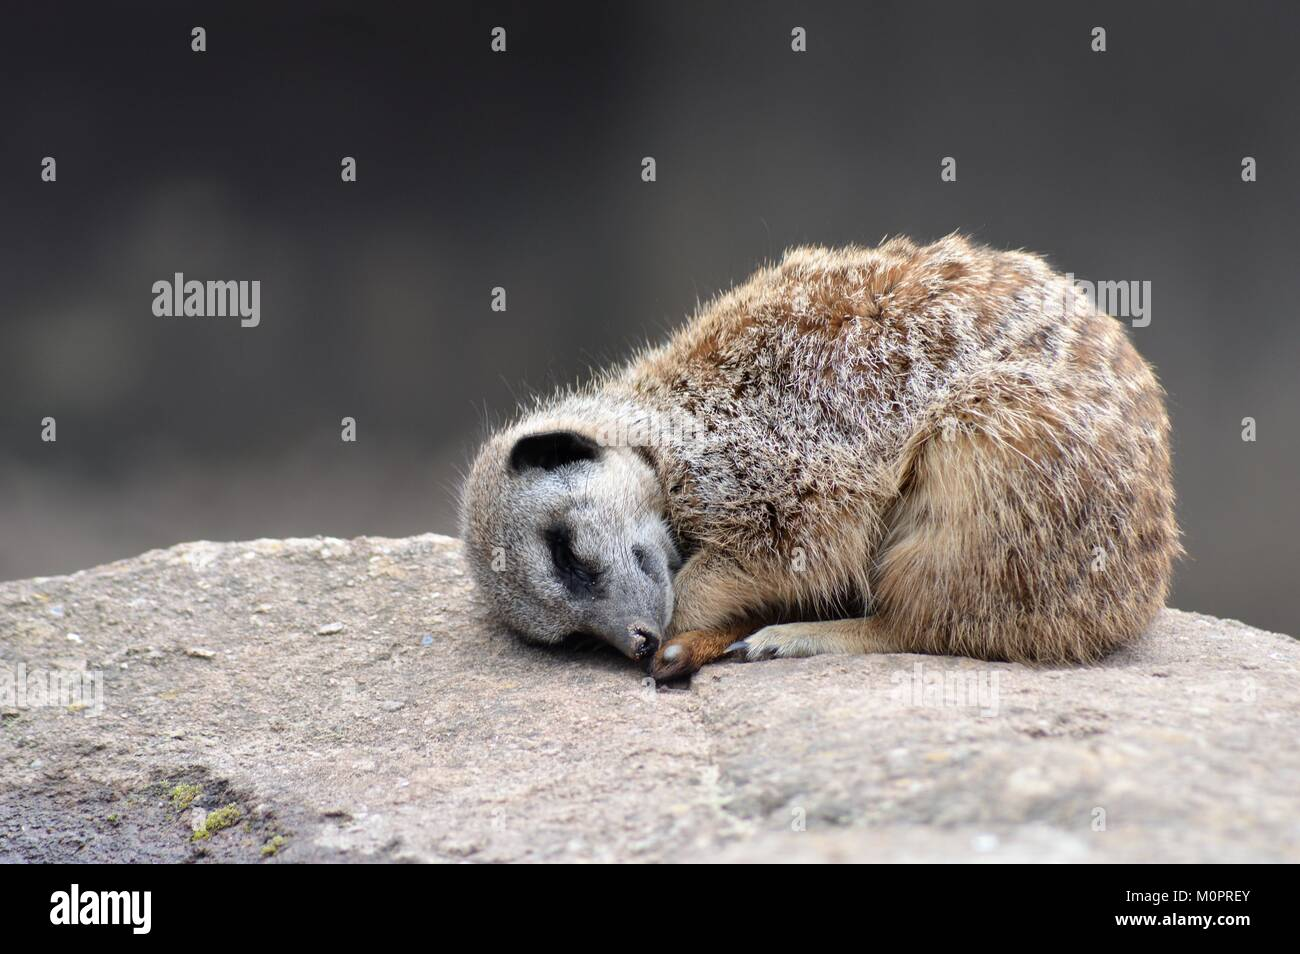 Sleeping Meerkat - Stock Image